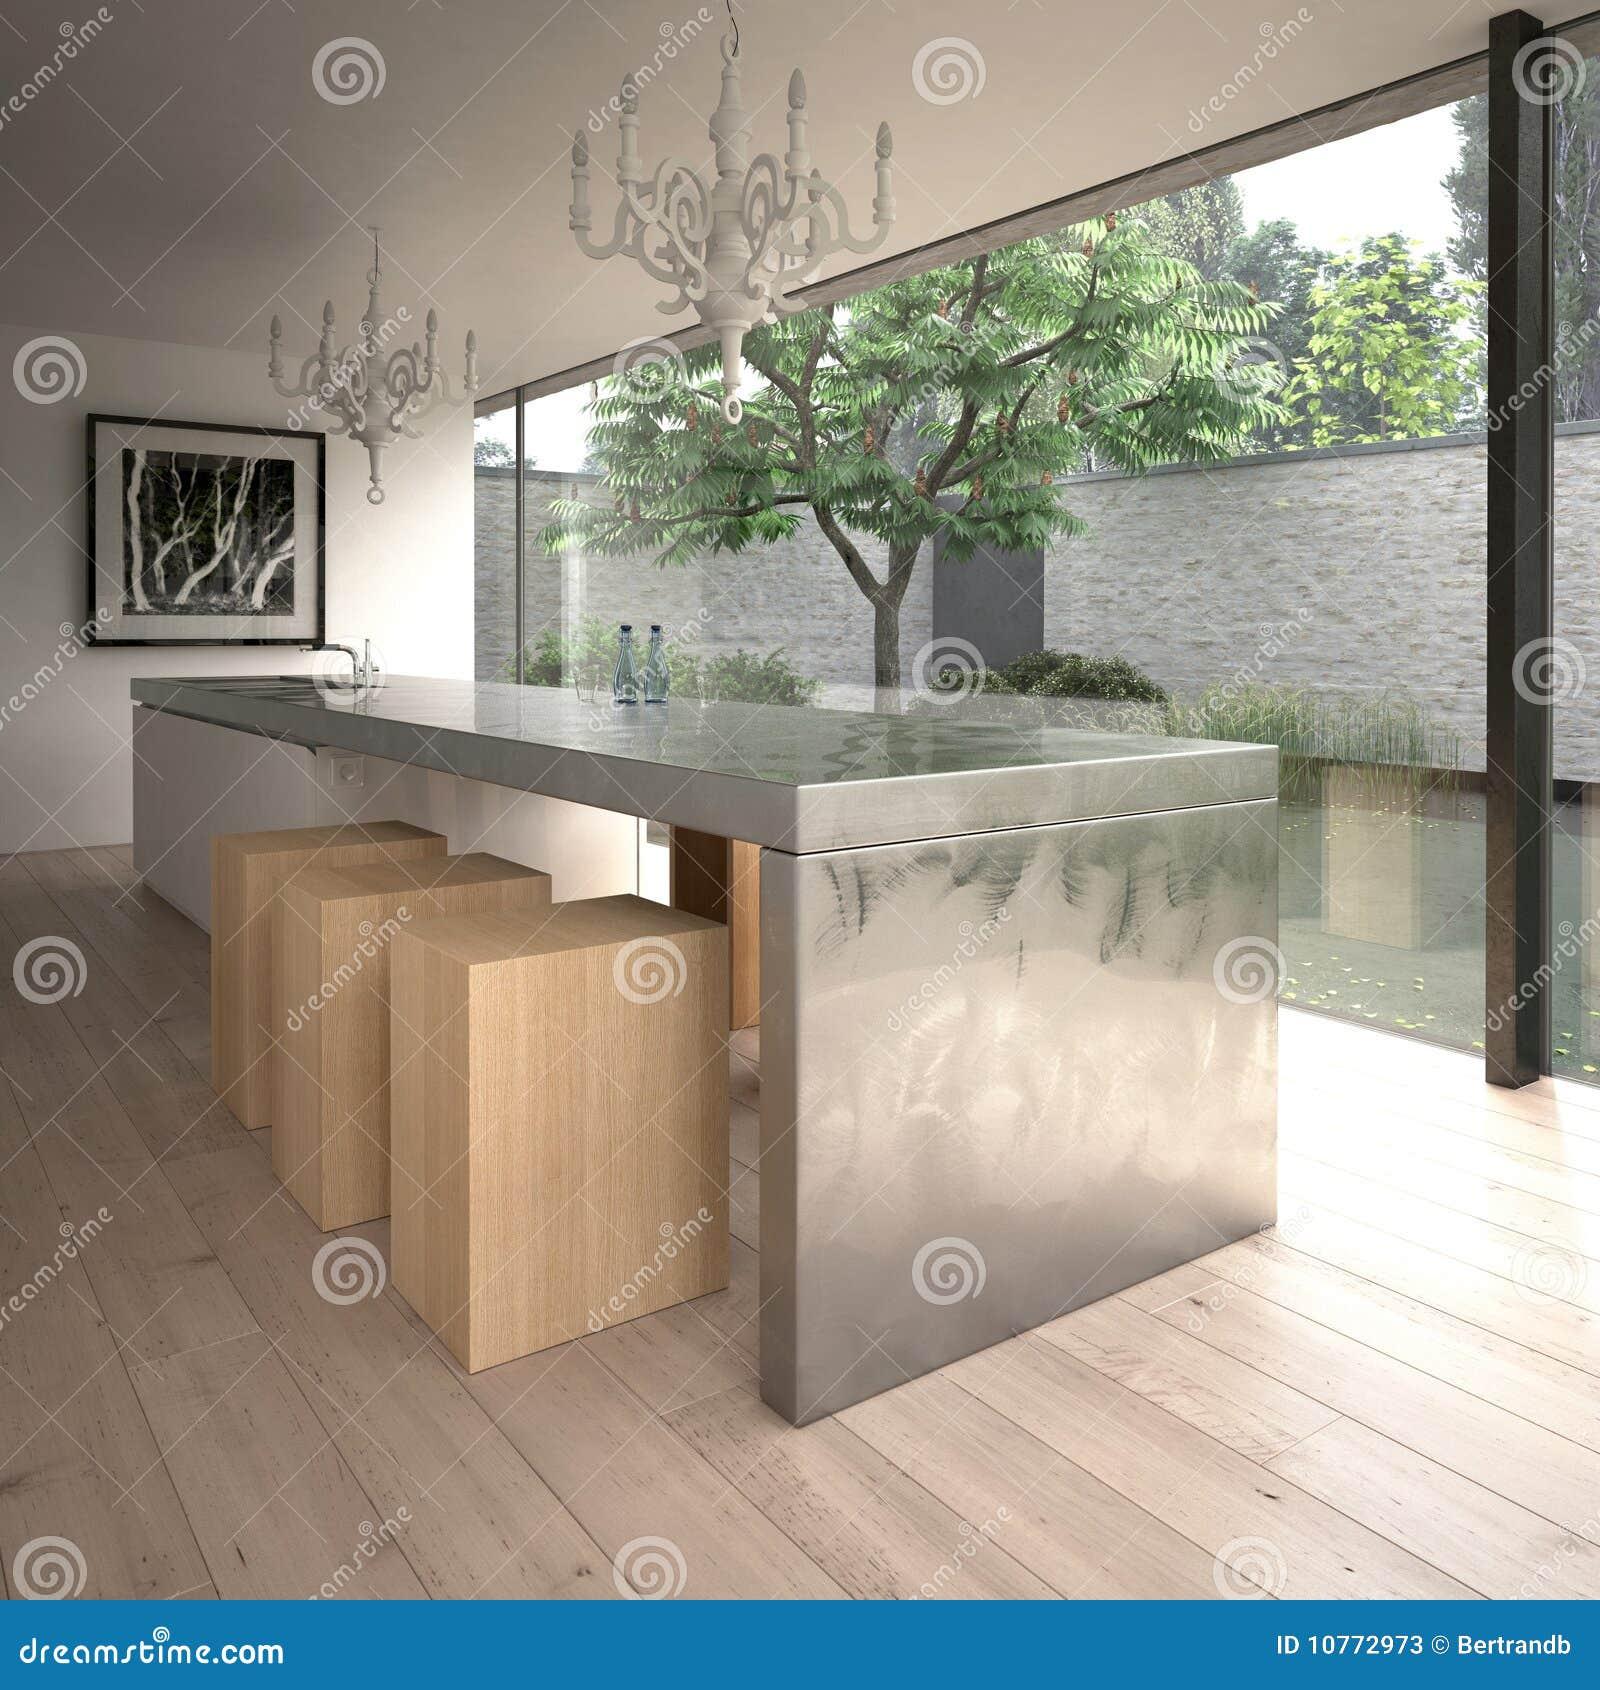 Isola di cucina d 39 acciaio moderna illustrazione di stock illustrazione di esterno vetro 10772973 - Cucina acciaio prezzi ...